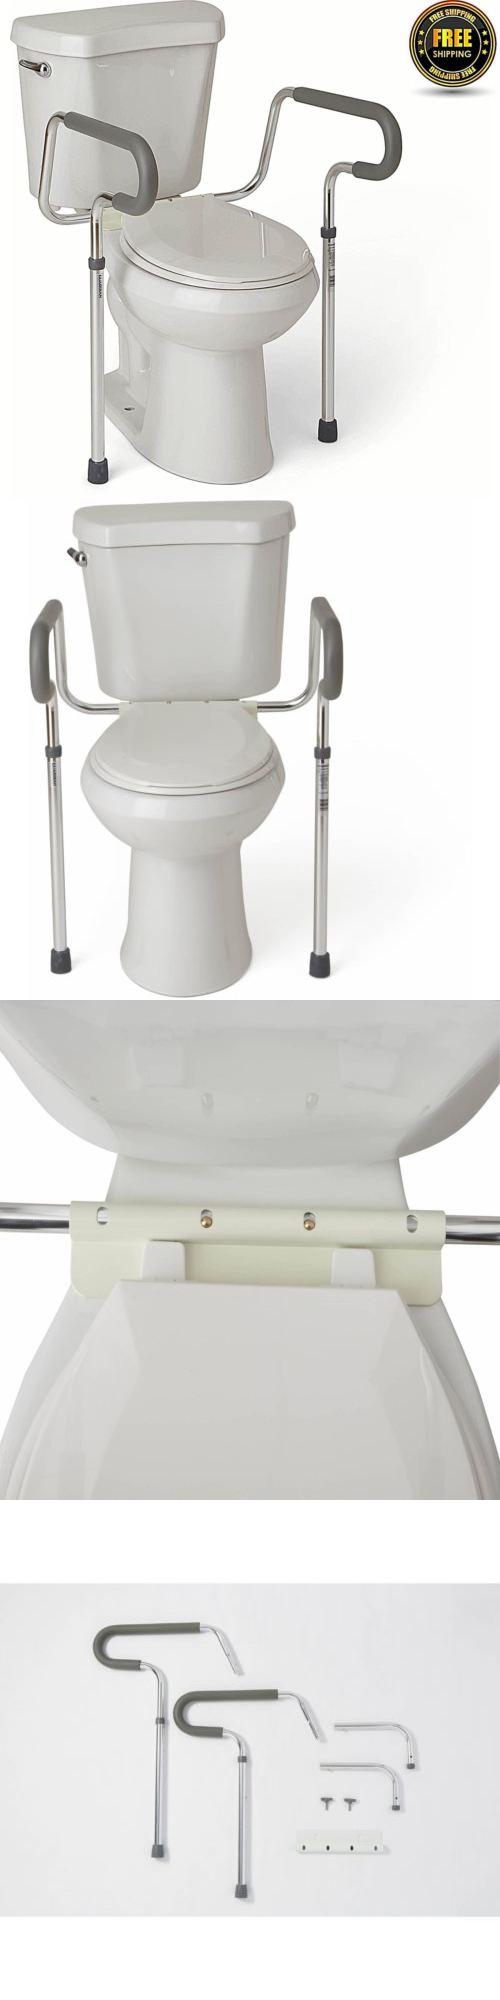 Handles and Rails: Handicap Grab Bars Adjustable Toilet Safety ...